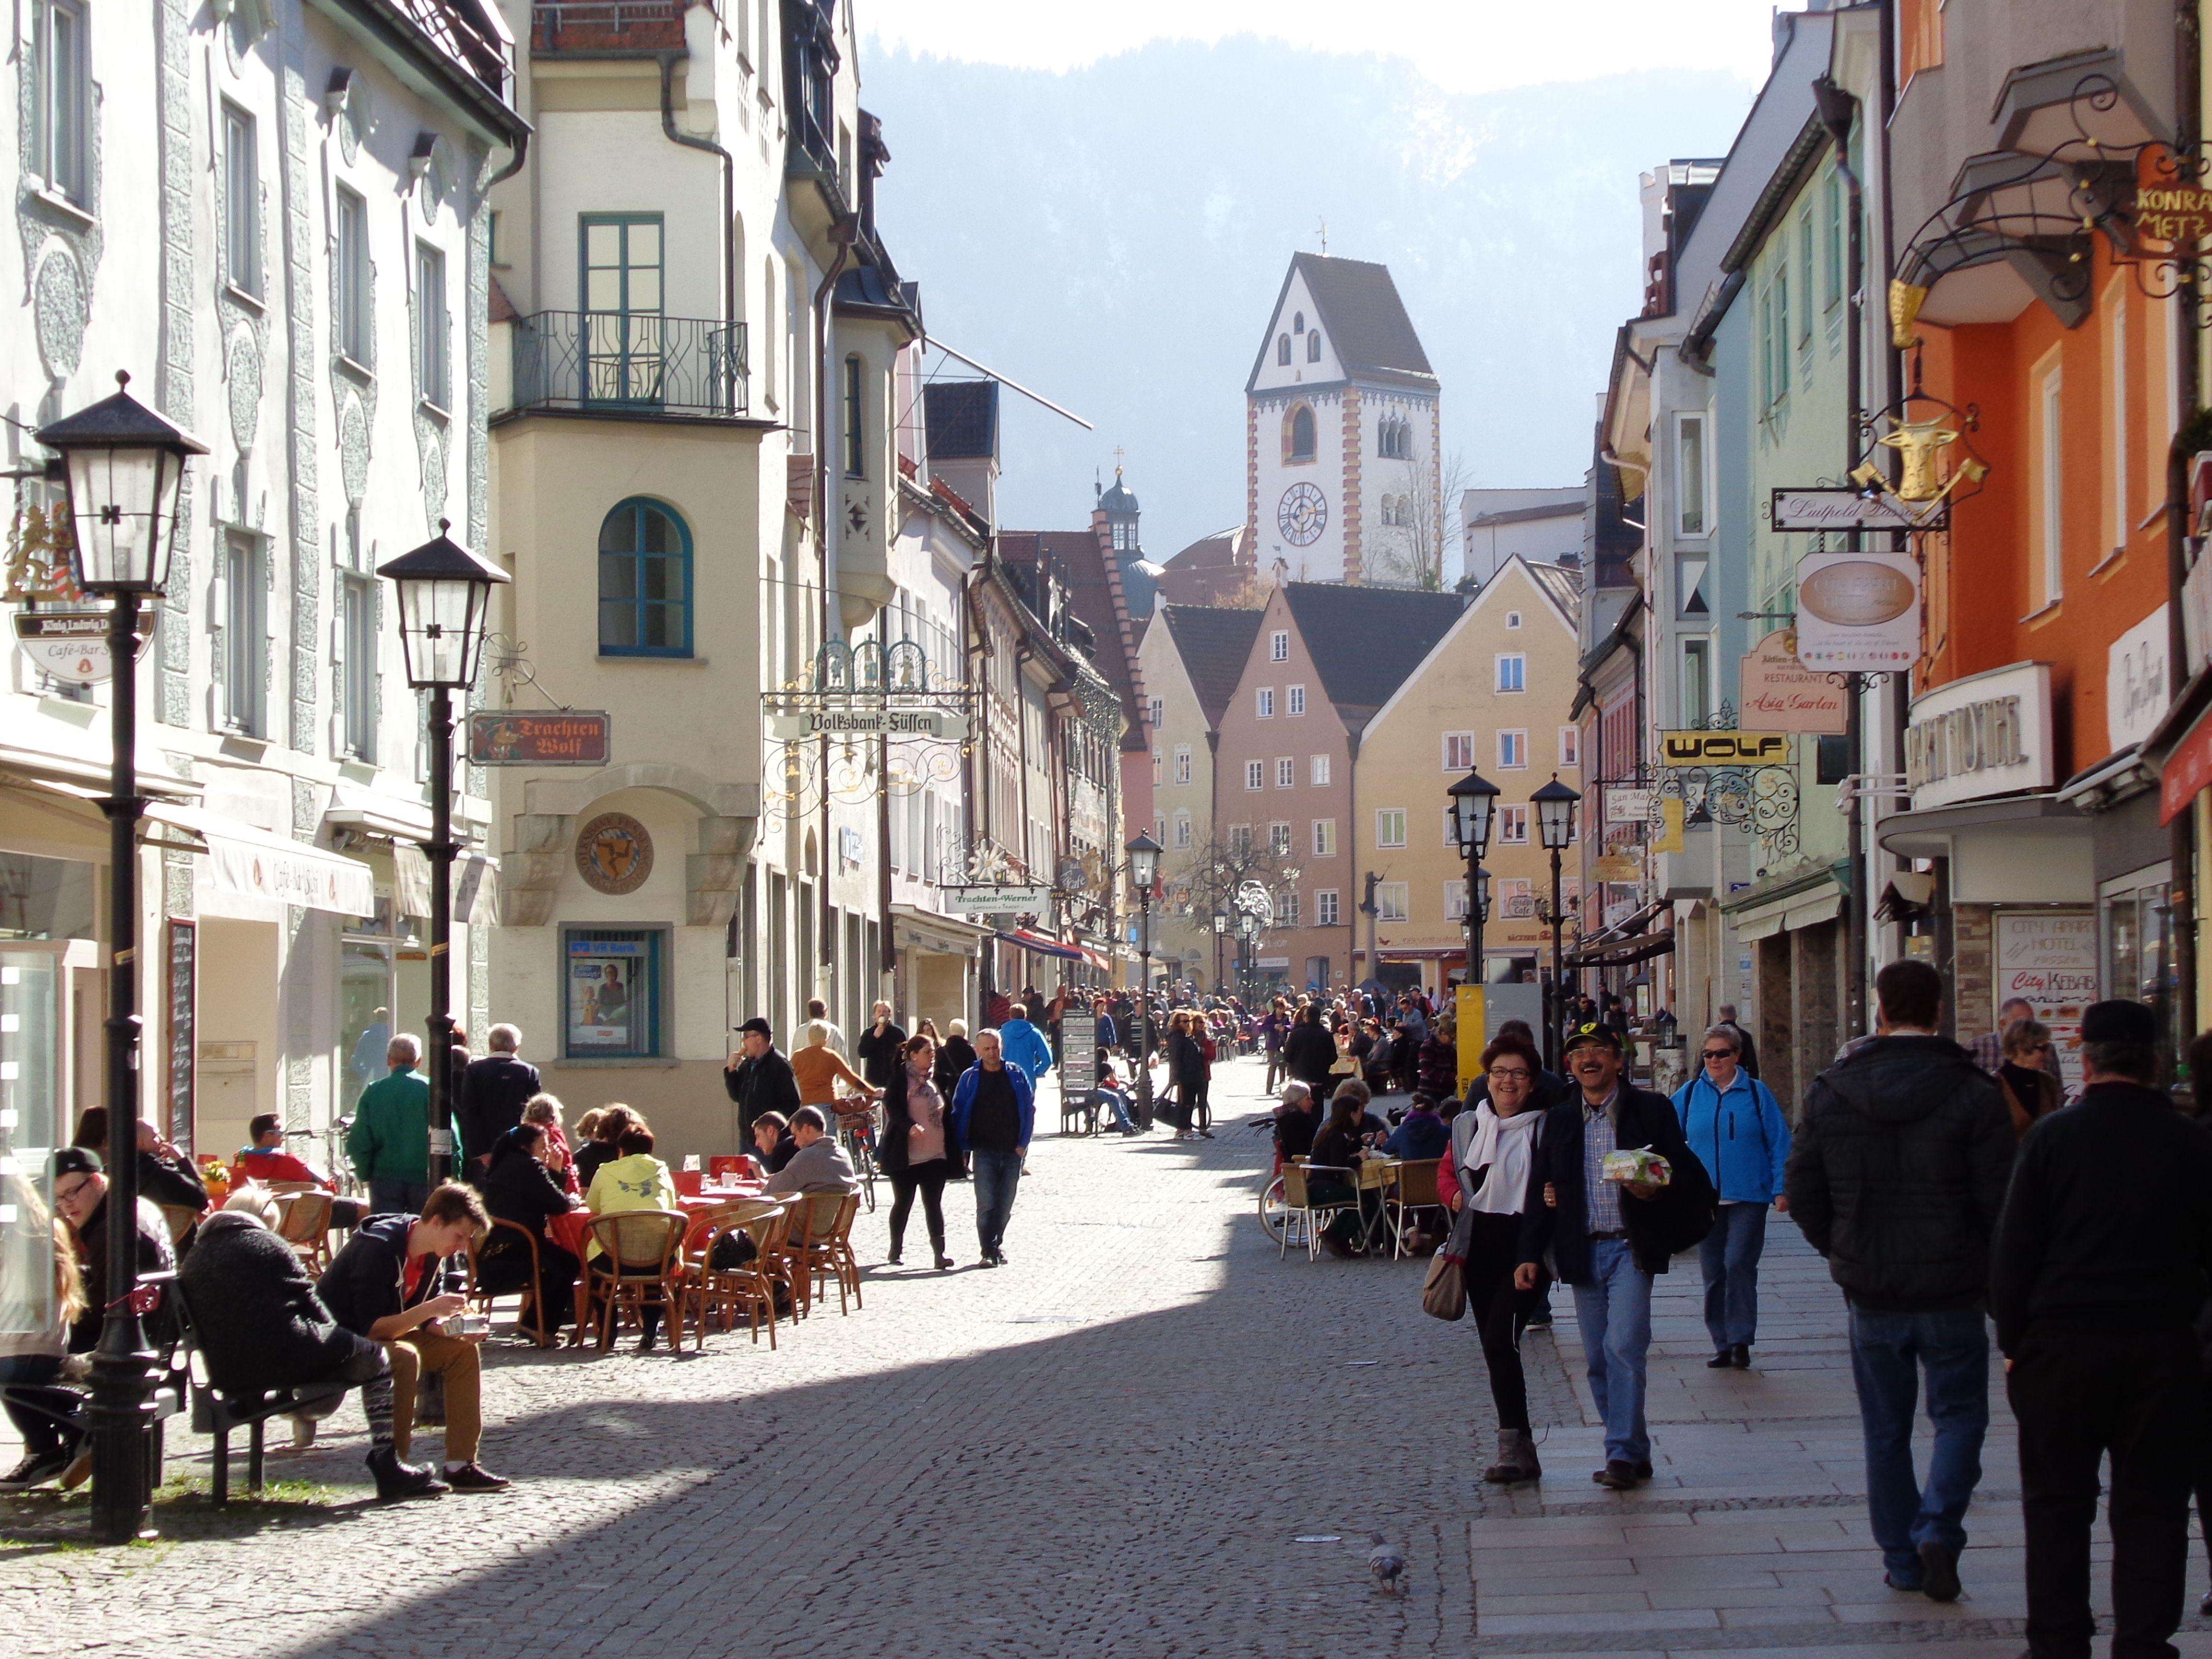 Innenstadt Füssen   Germany, Street view, Scenes